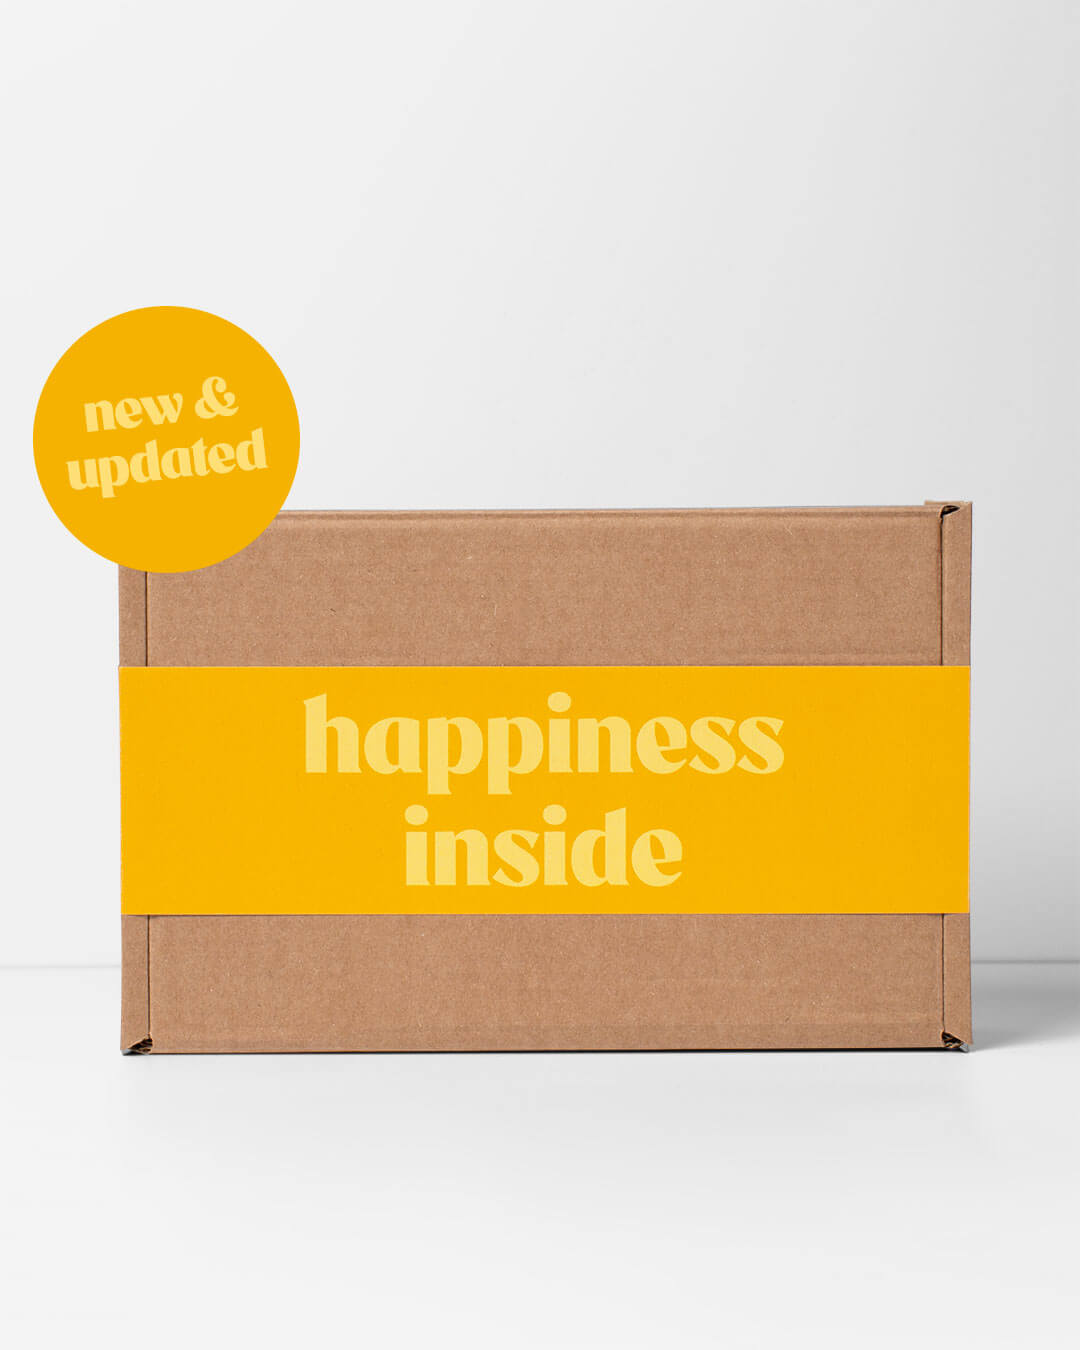 ta. soft drink box packaging